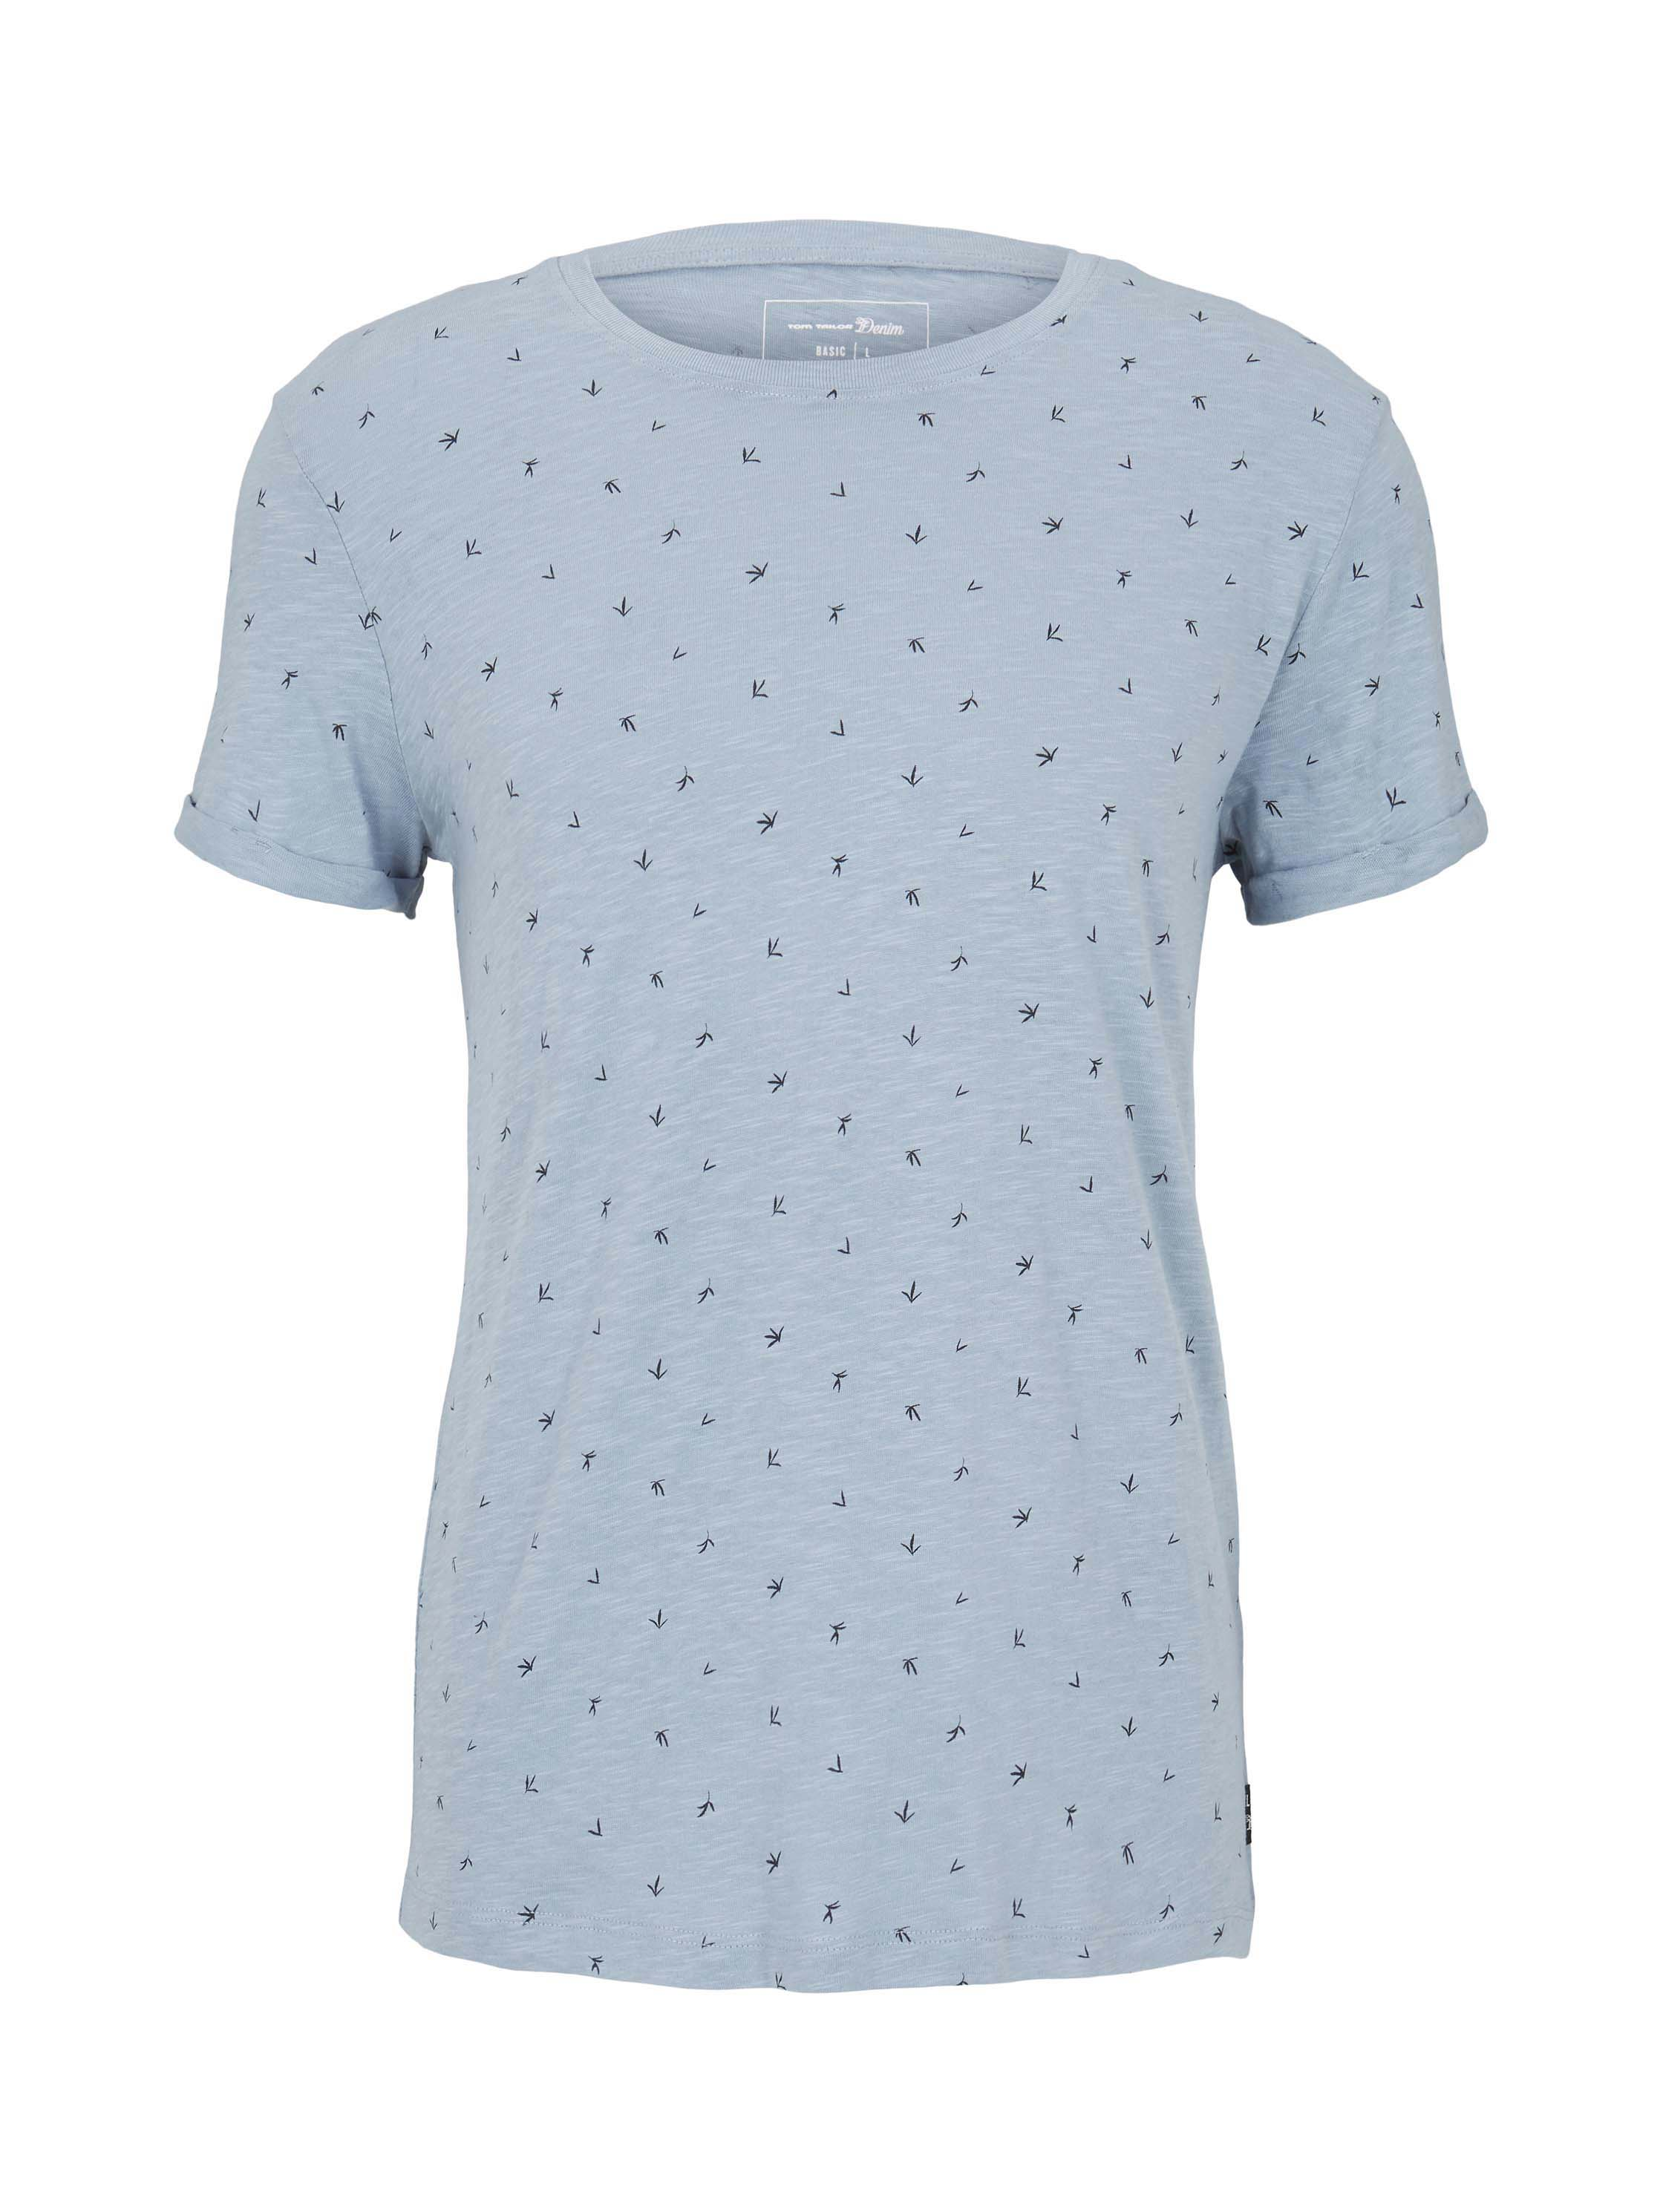 alloverprinted T-shirt, blue organic leaf print